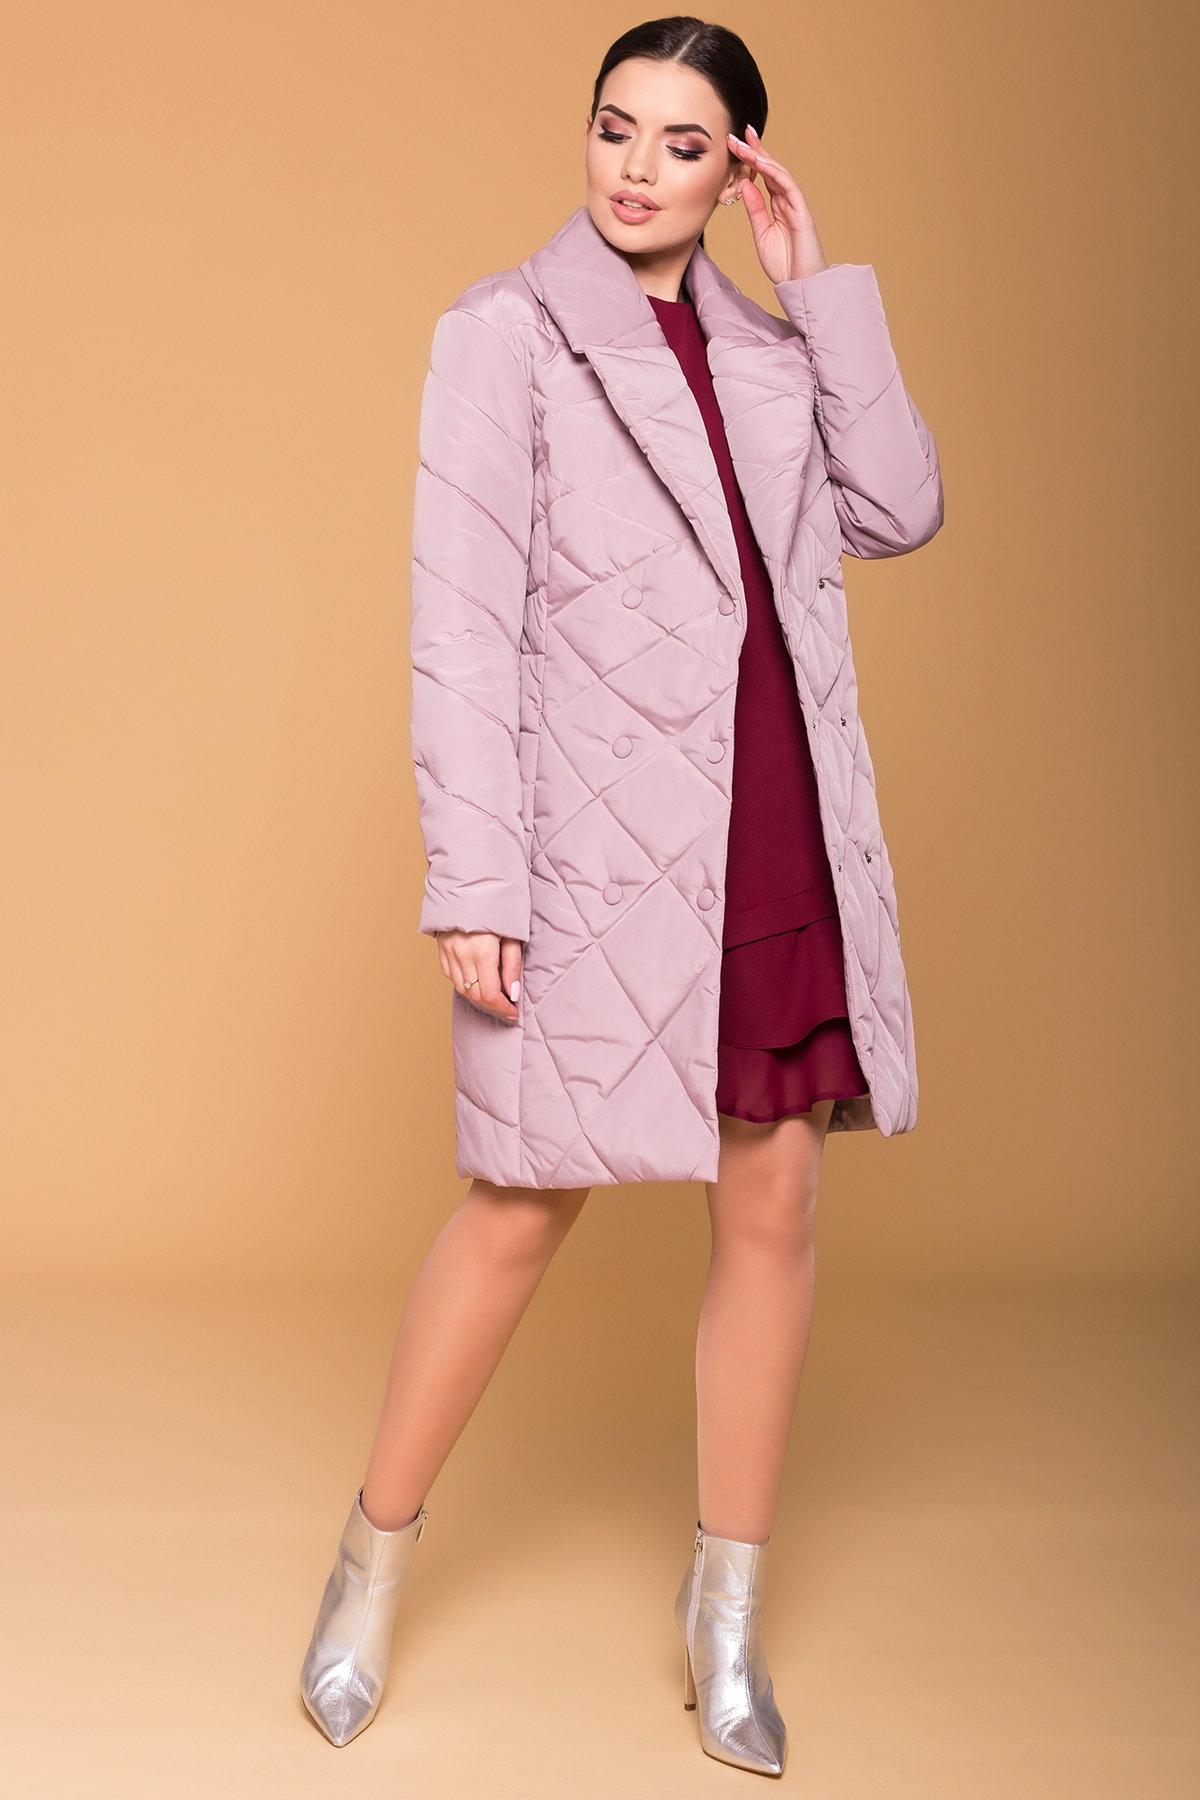 Пальто Сандра 4440 Цвет: Серо-розовый